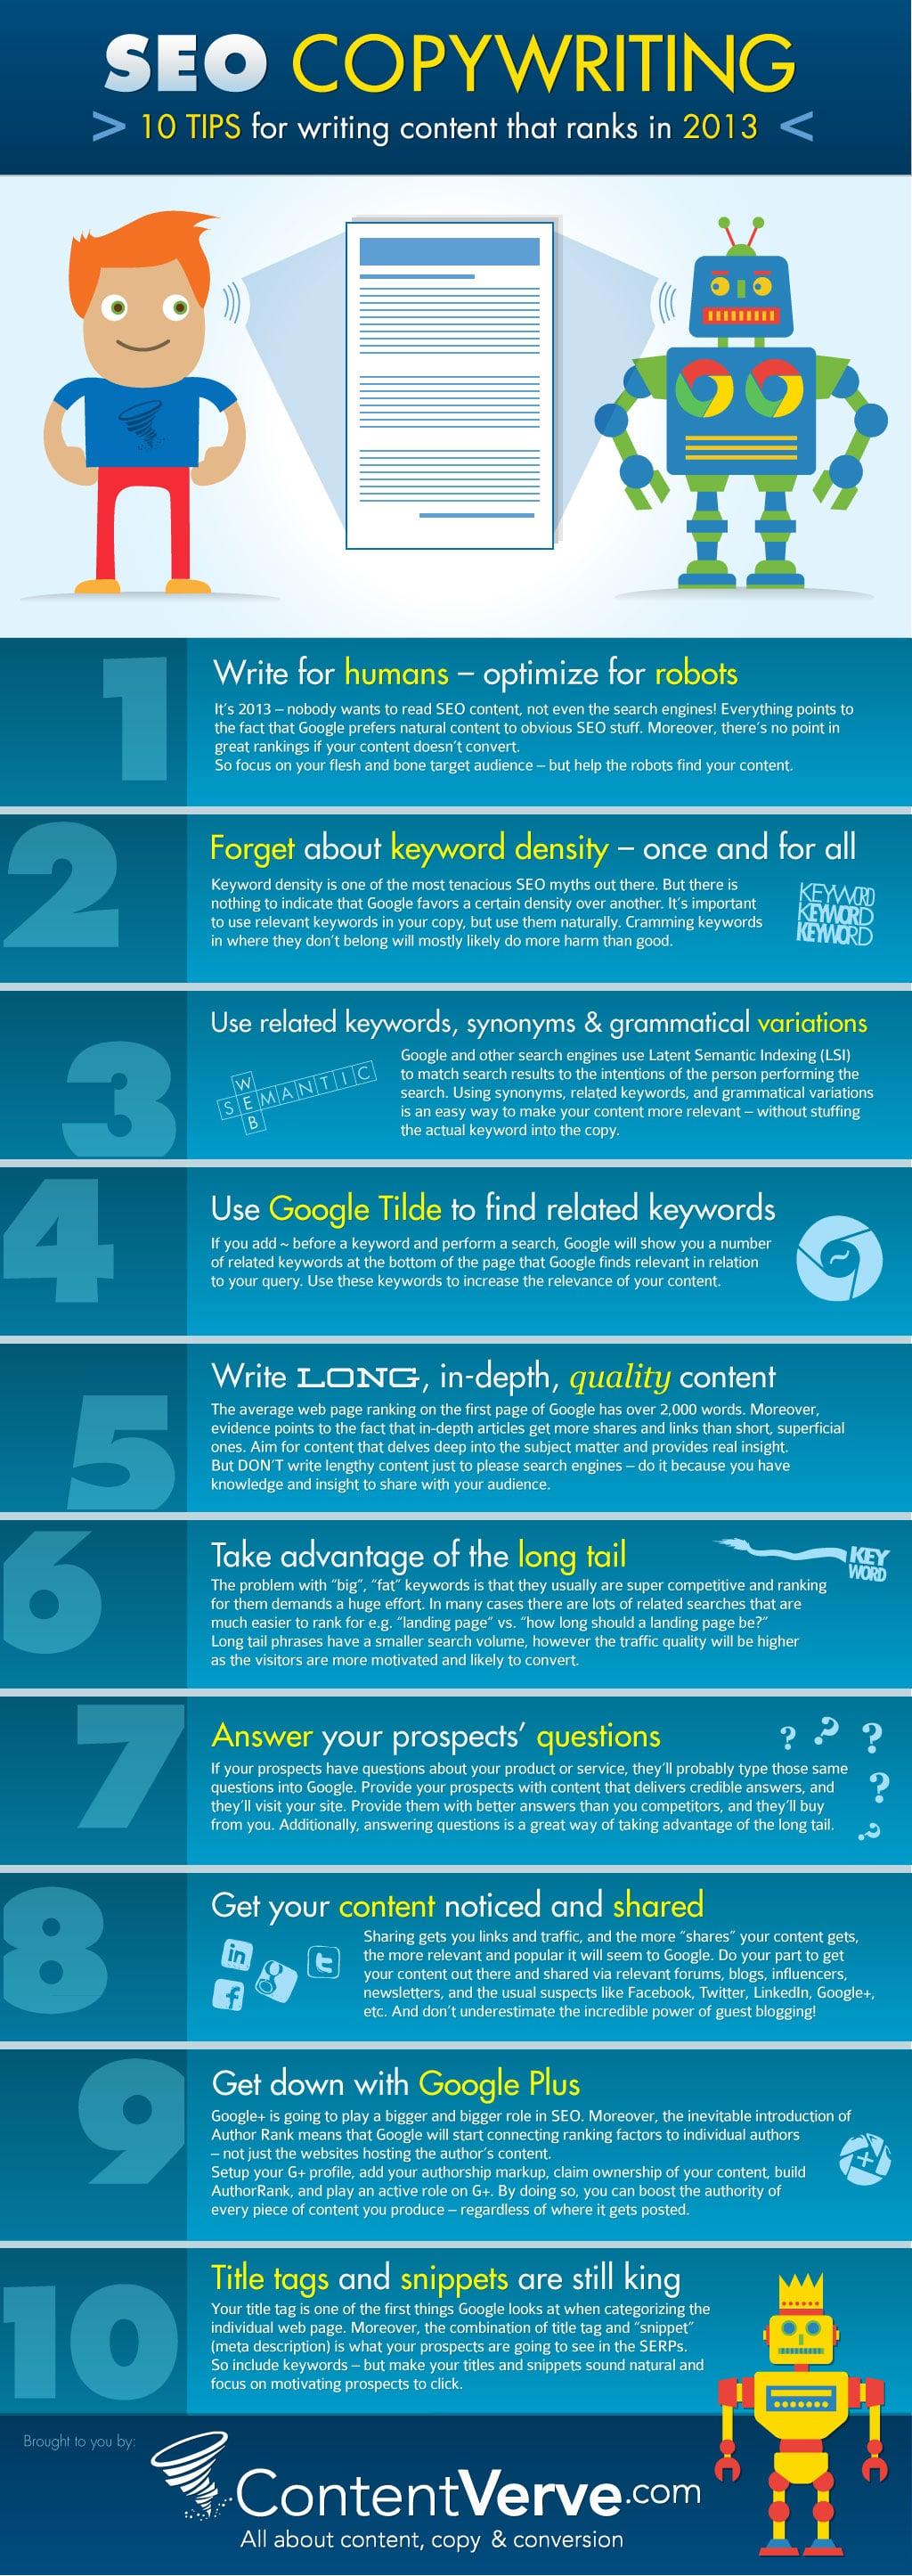 seo-copywriting-content-ranking-infographic